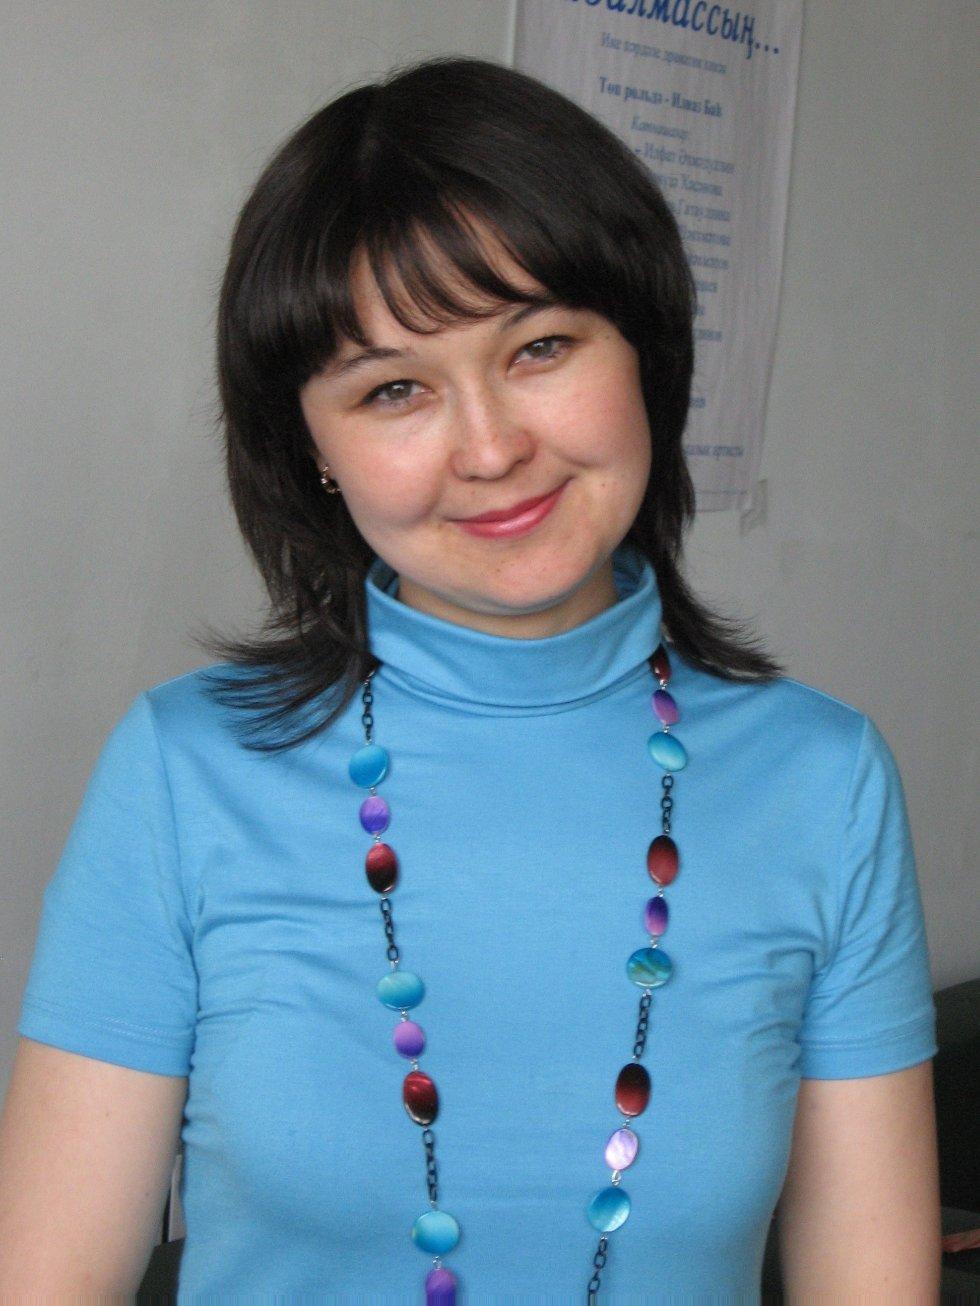 Габдрахманова Фануза Хайдаровна